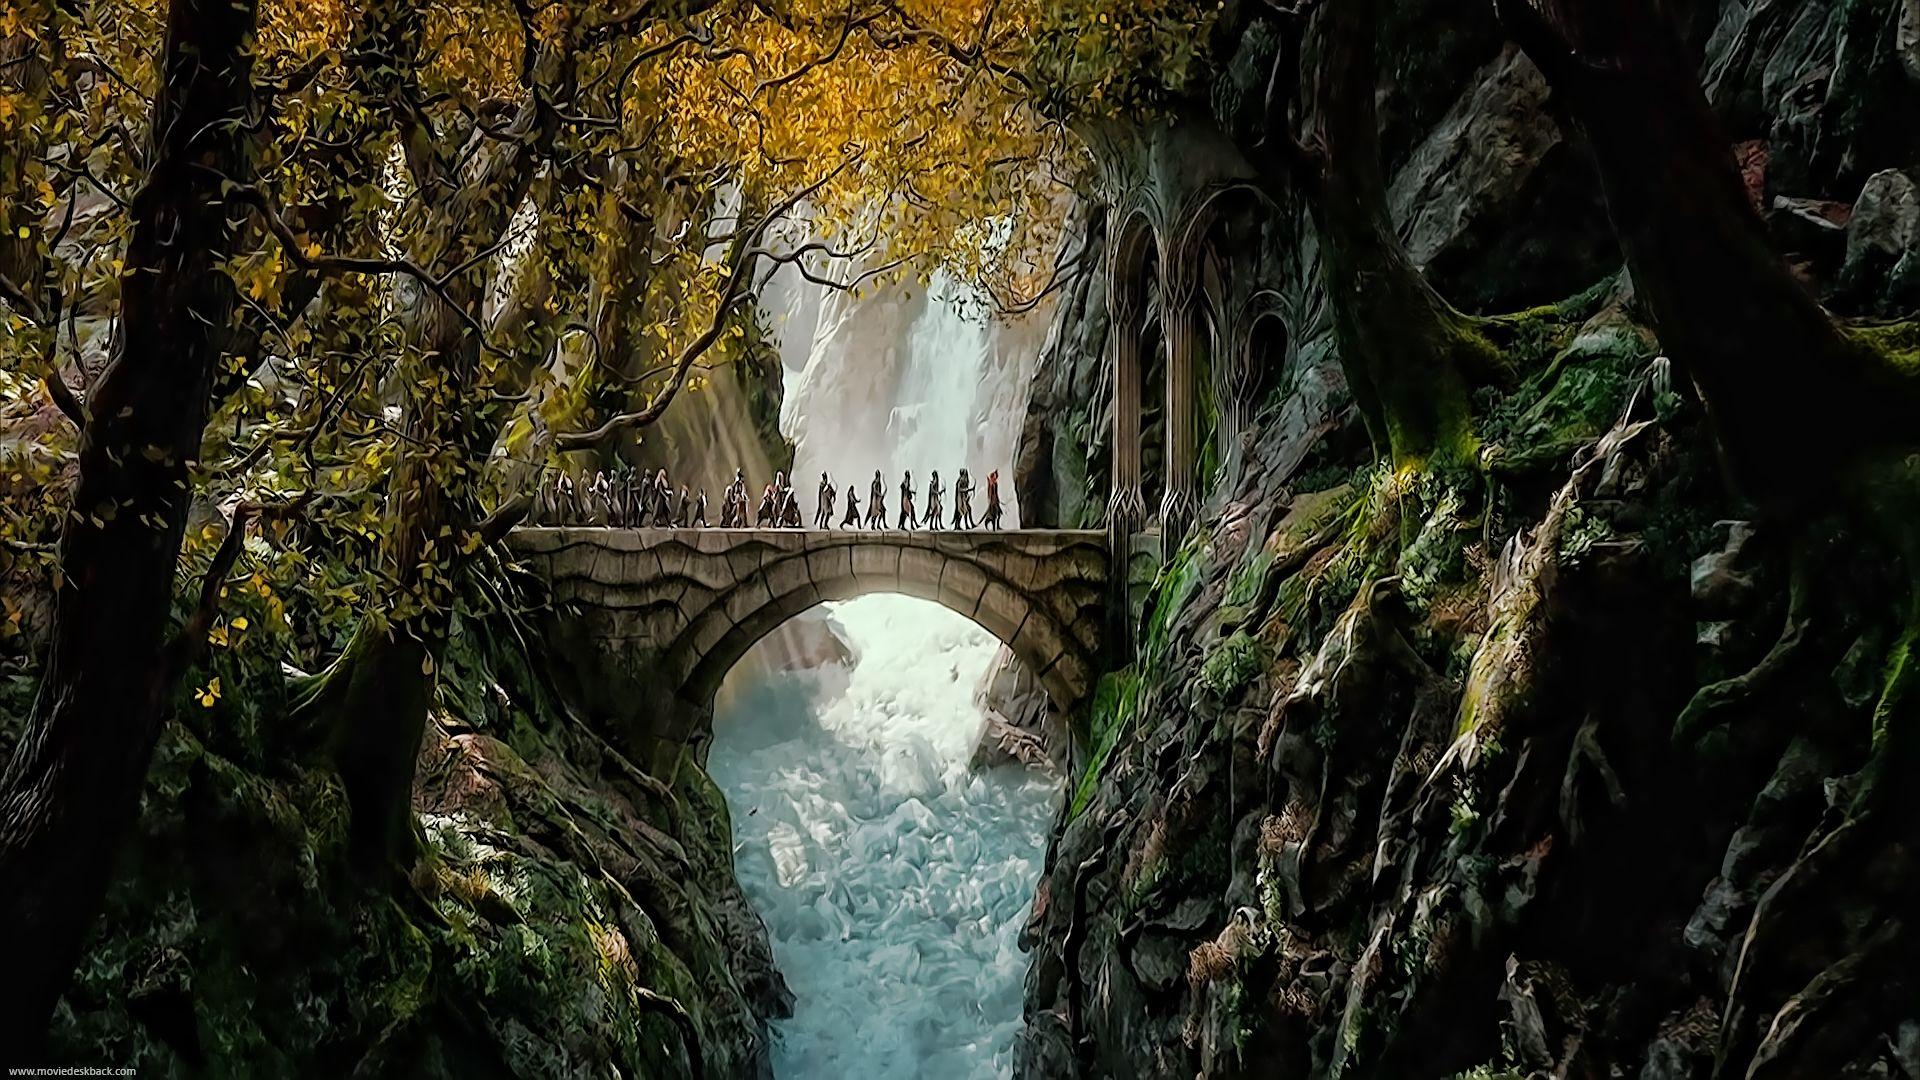 Free The Hobbit Hd Wallpapers Download Pixelstalk Net The Hobbit I See Fire Hobbit Desolation Of Smaug